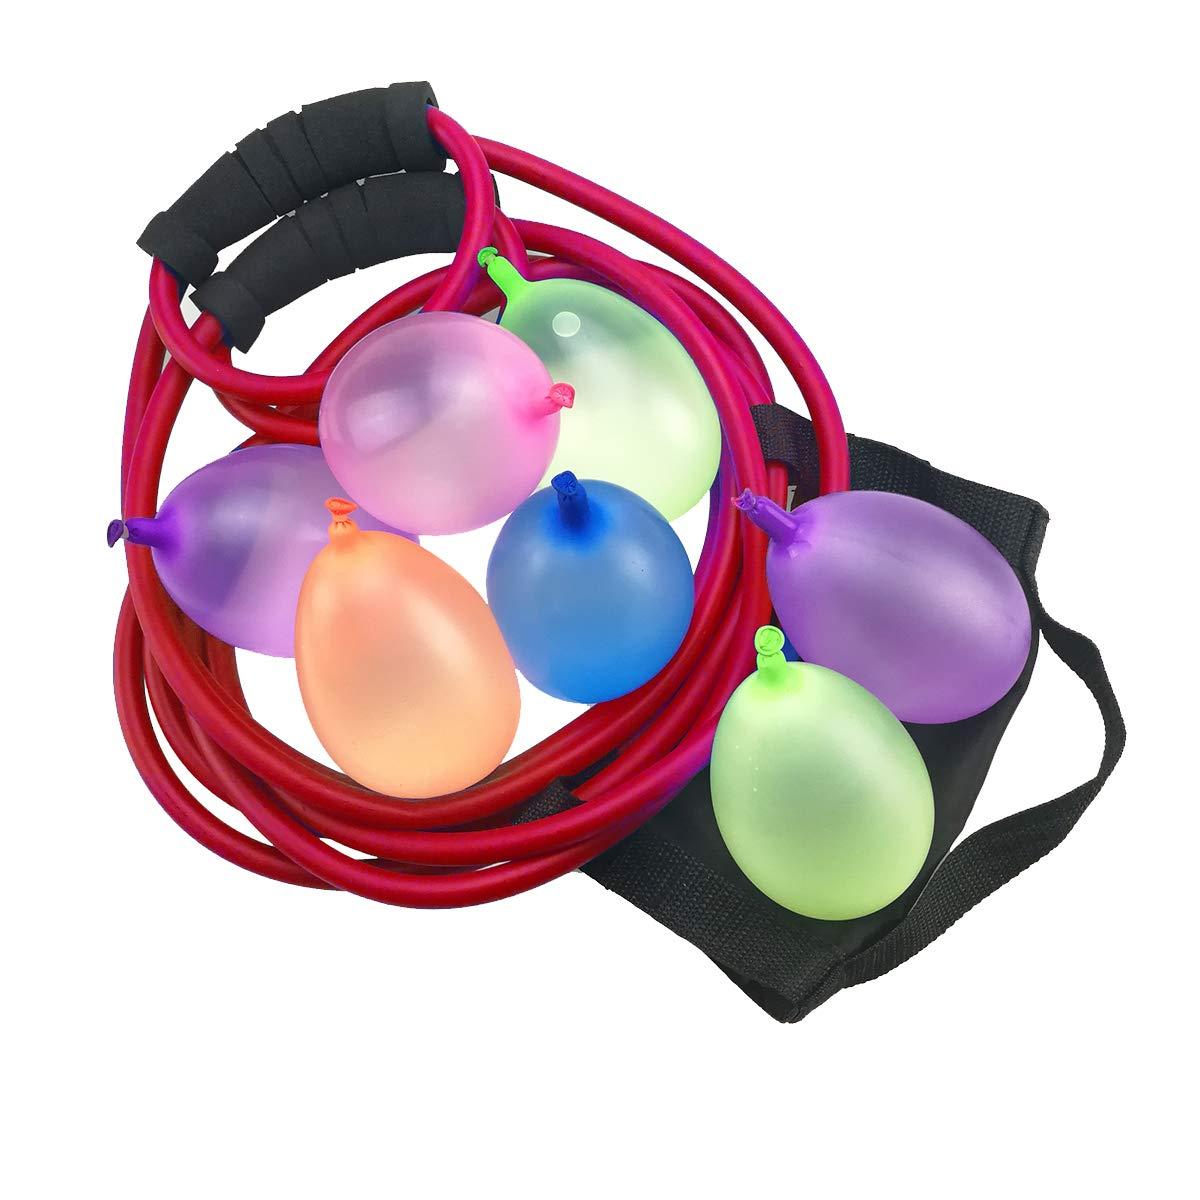 KOMVOX Water Balloon Launcher 400 Yard Long Range, 3 Person Balloon Large Slingshot Trebuchet, Tshirt Slingshot Launcher, Water Cannons Yard Toys, 500 Balloons Included by KOMVOX (Image #4)